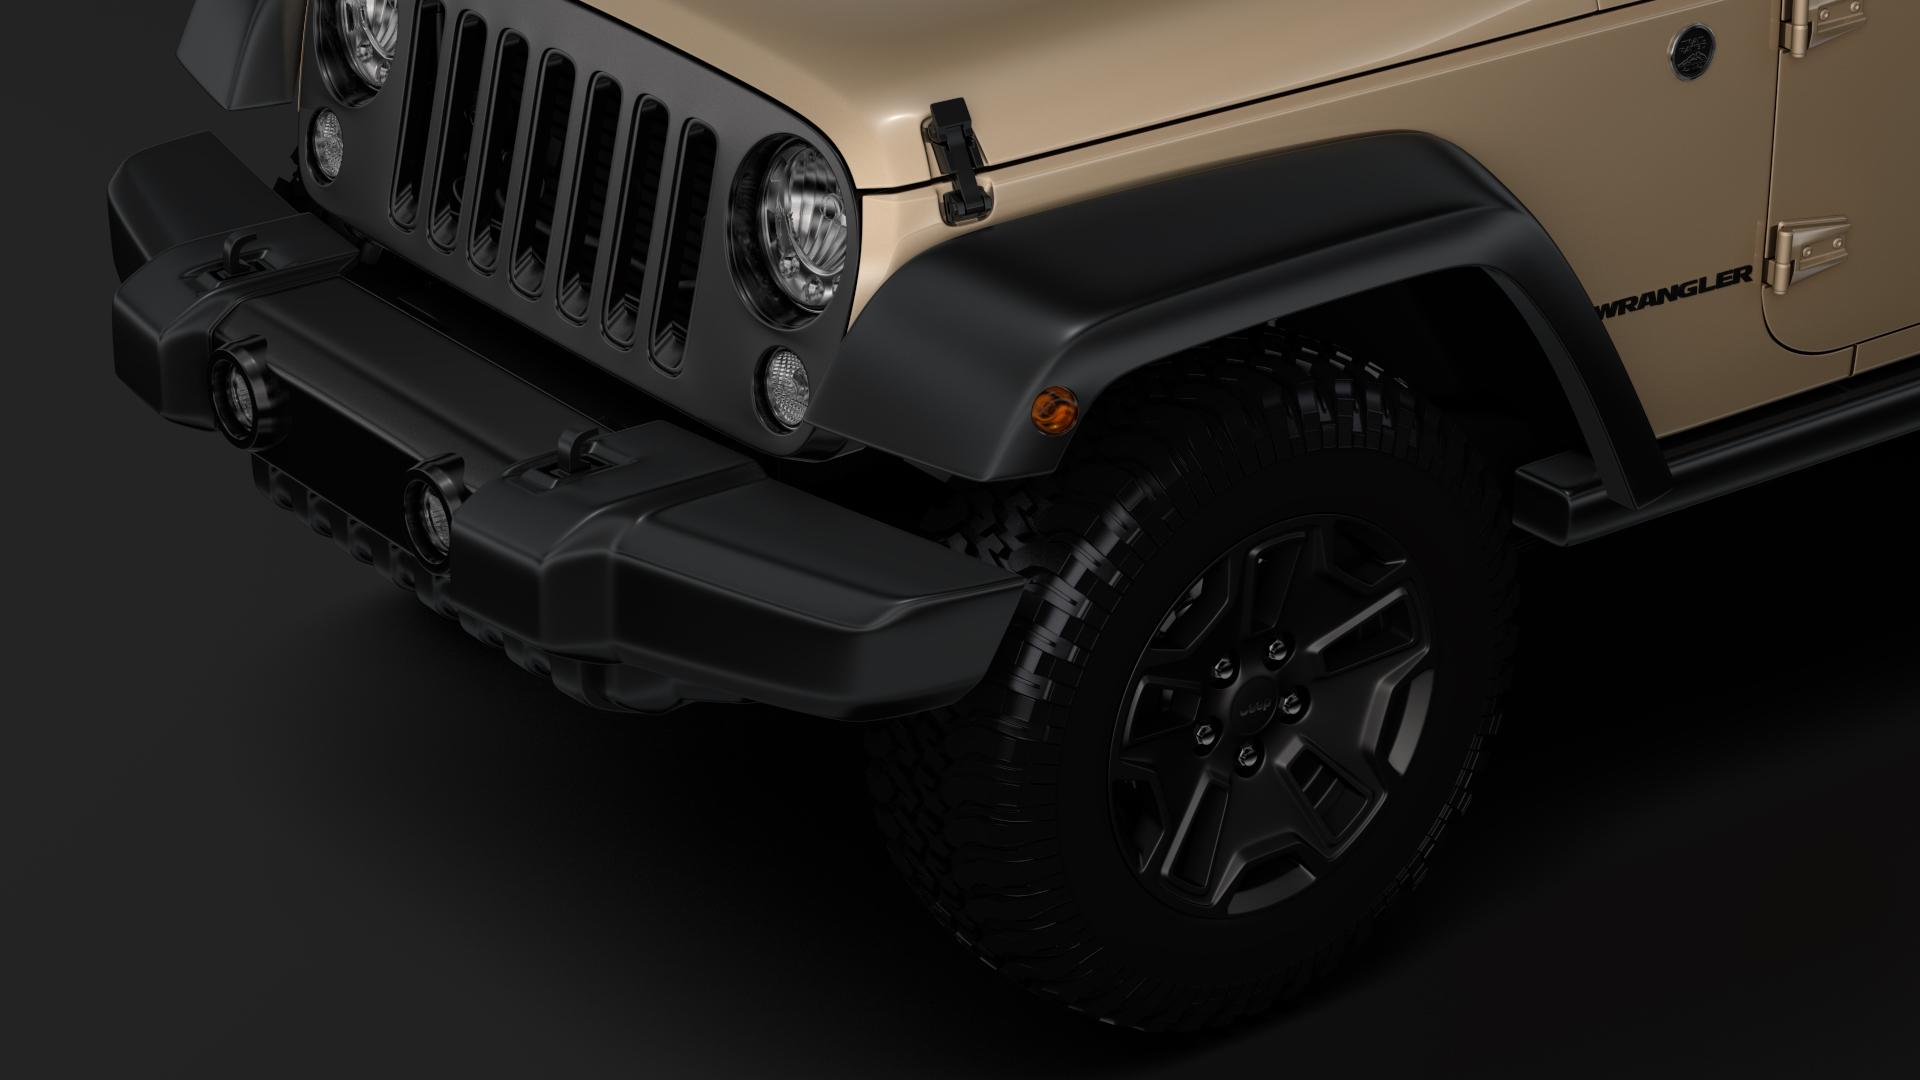 jeep wrangler willys wheeler jk 2017 3d model max fbx c4d lwo ma mb hrc xsi obj 276798